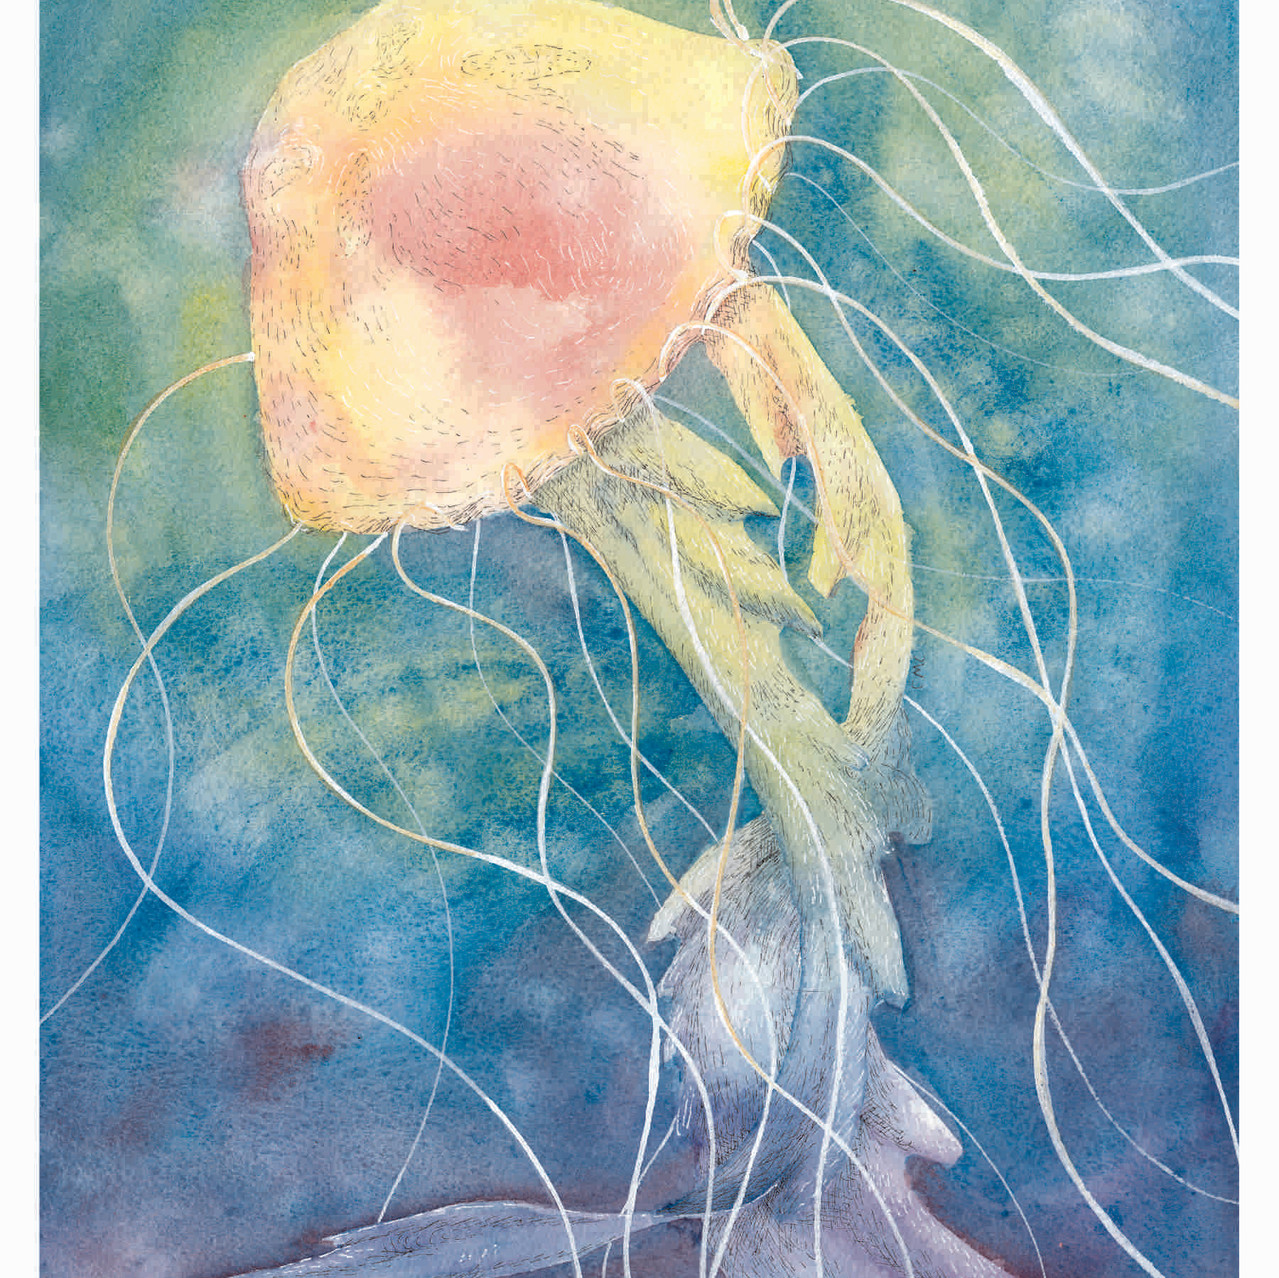 Jellyfish_Thumb